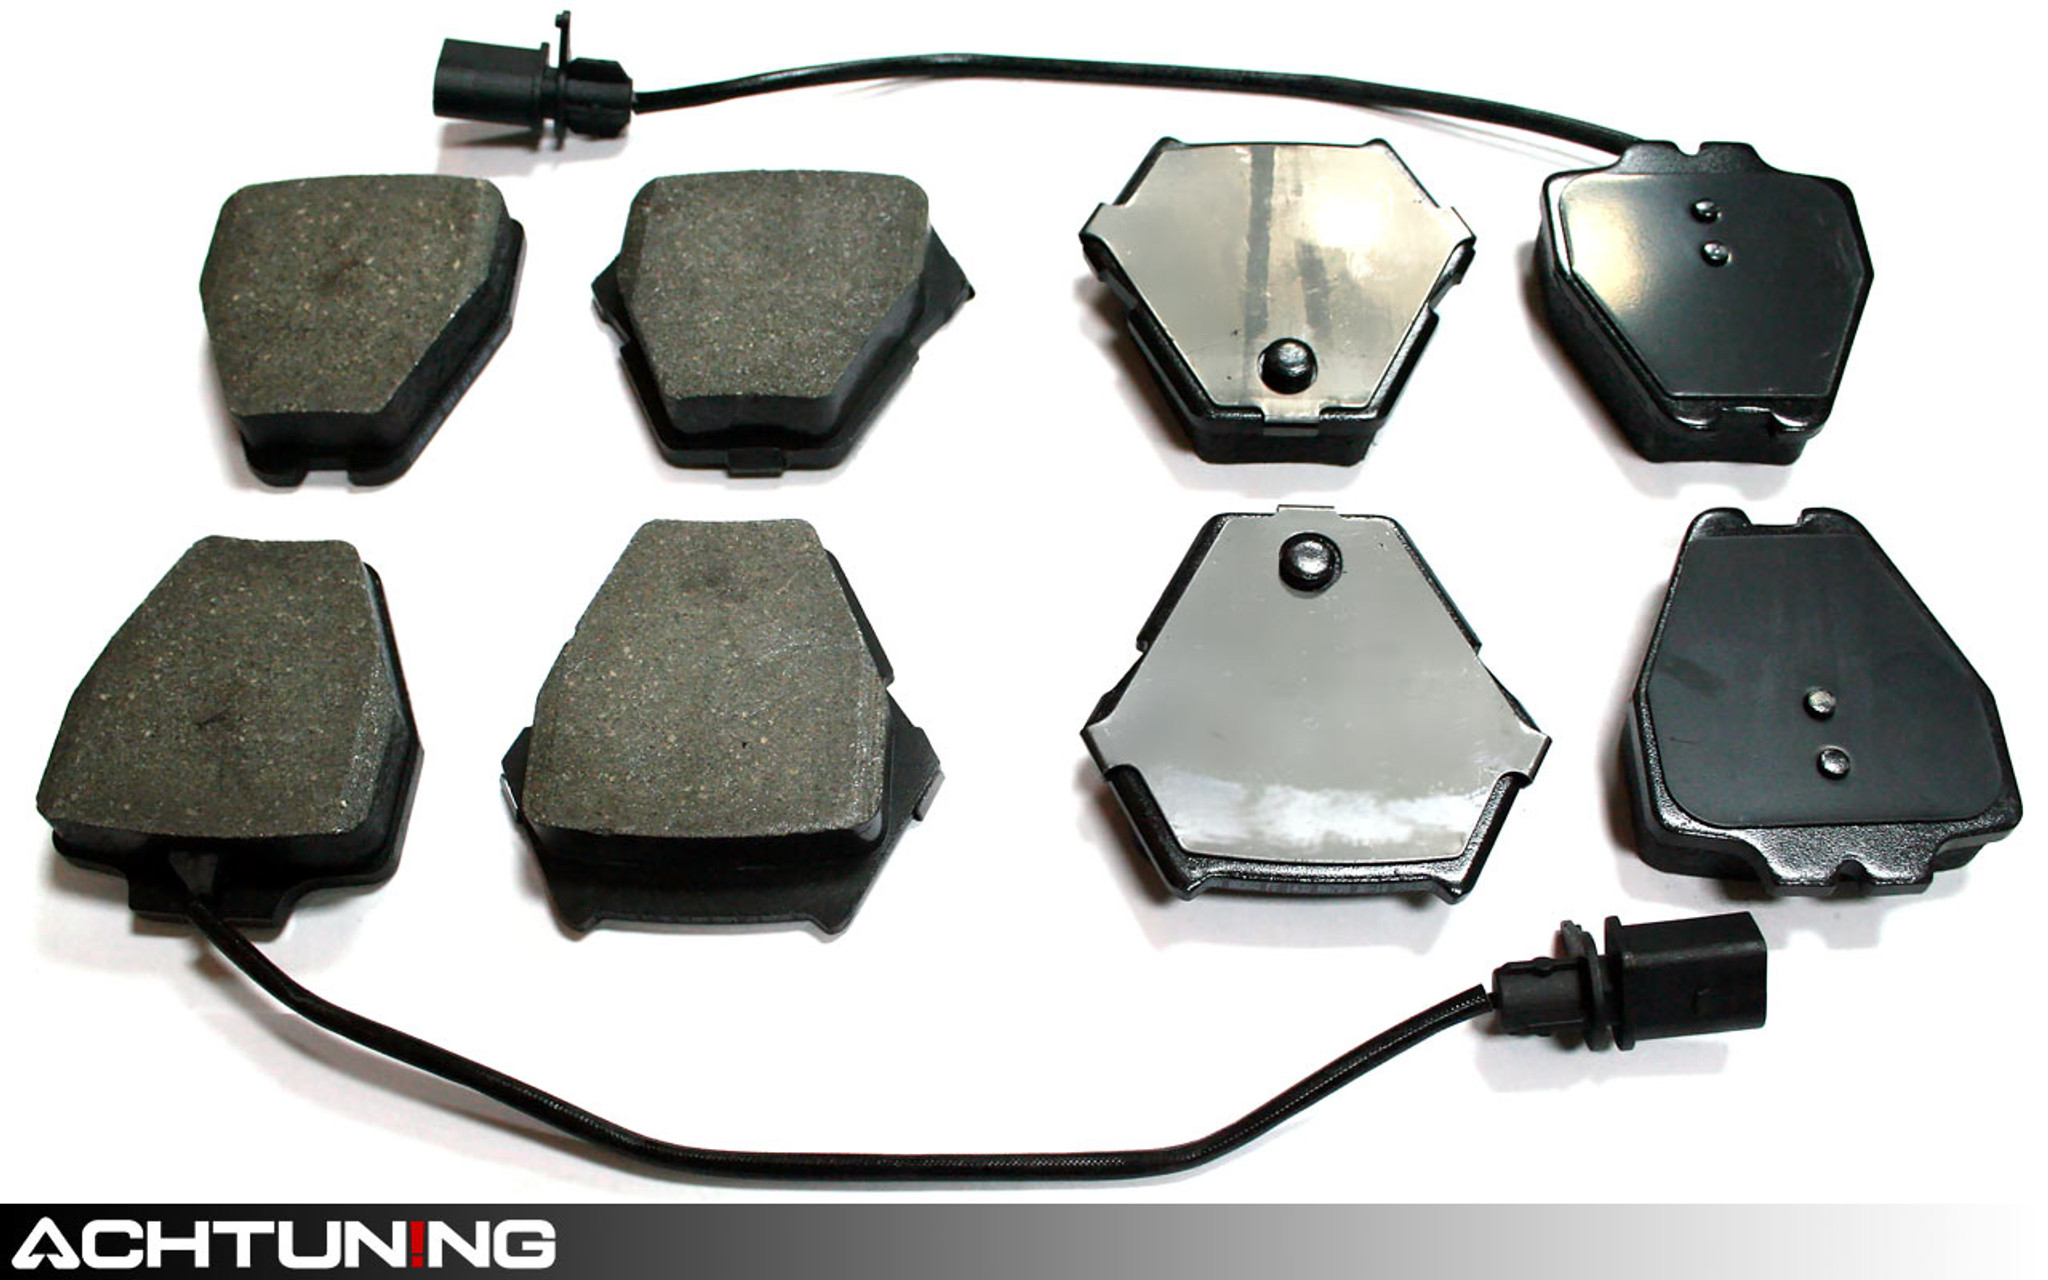 2002 2003 2004 For Volkswagen Beetle Rear Semi Metallic Brake Pads